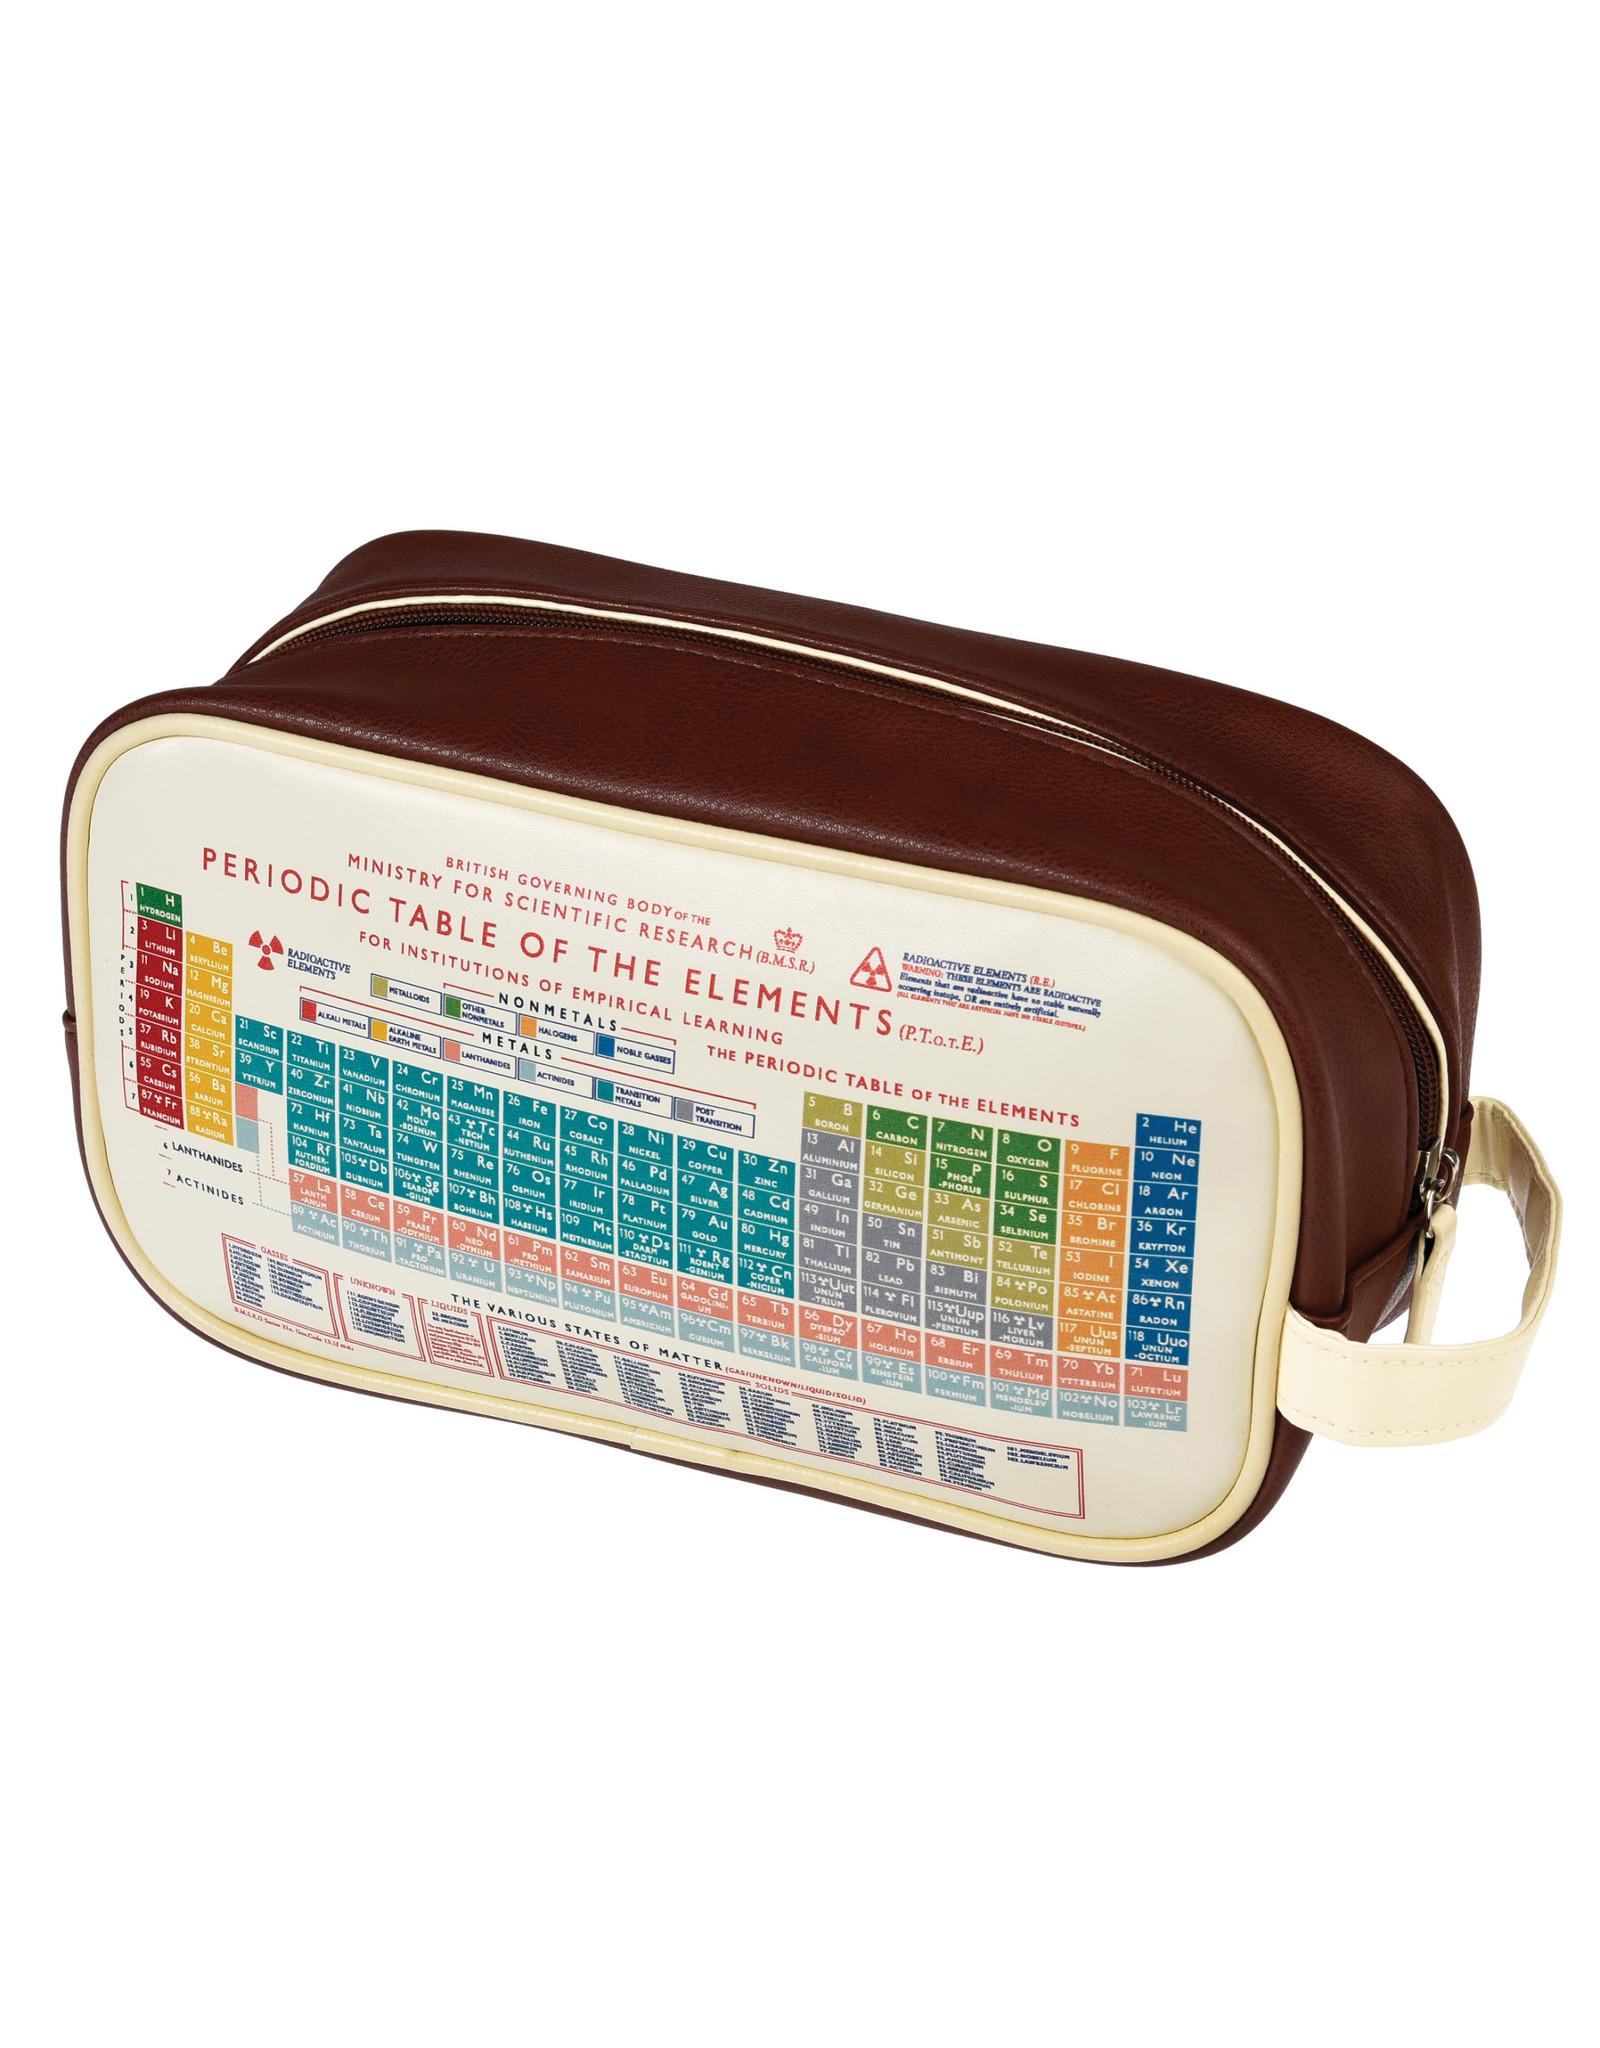 Toiletzak tabel van Mendelejev